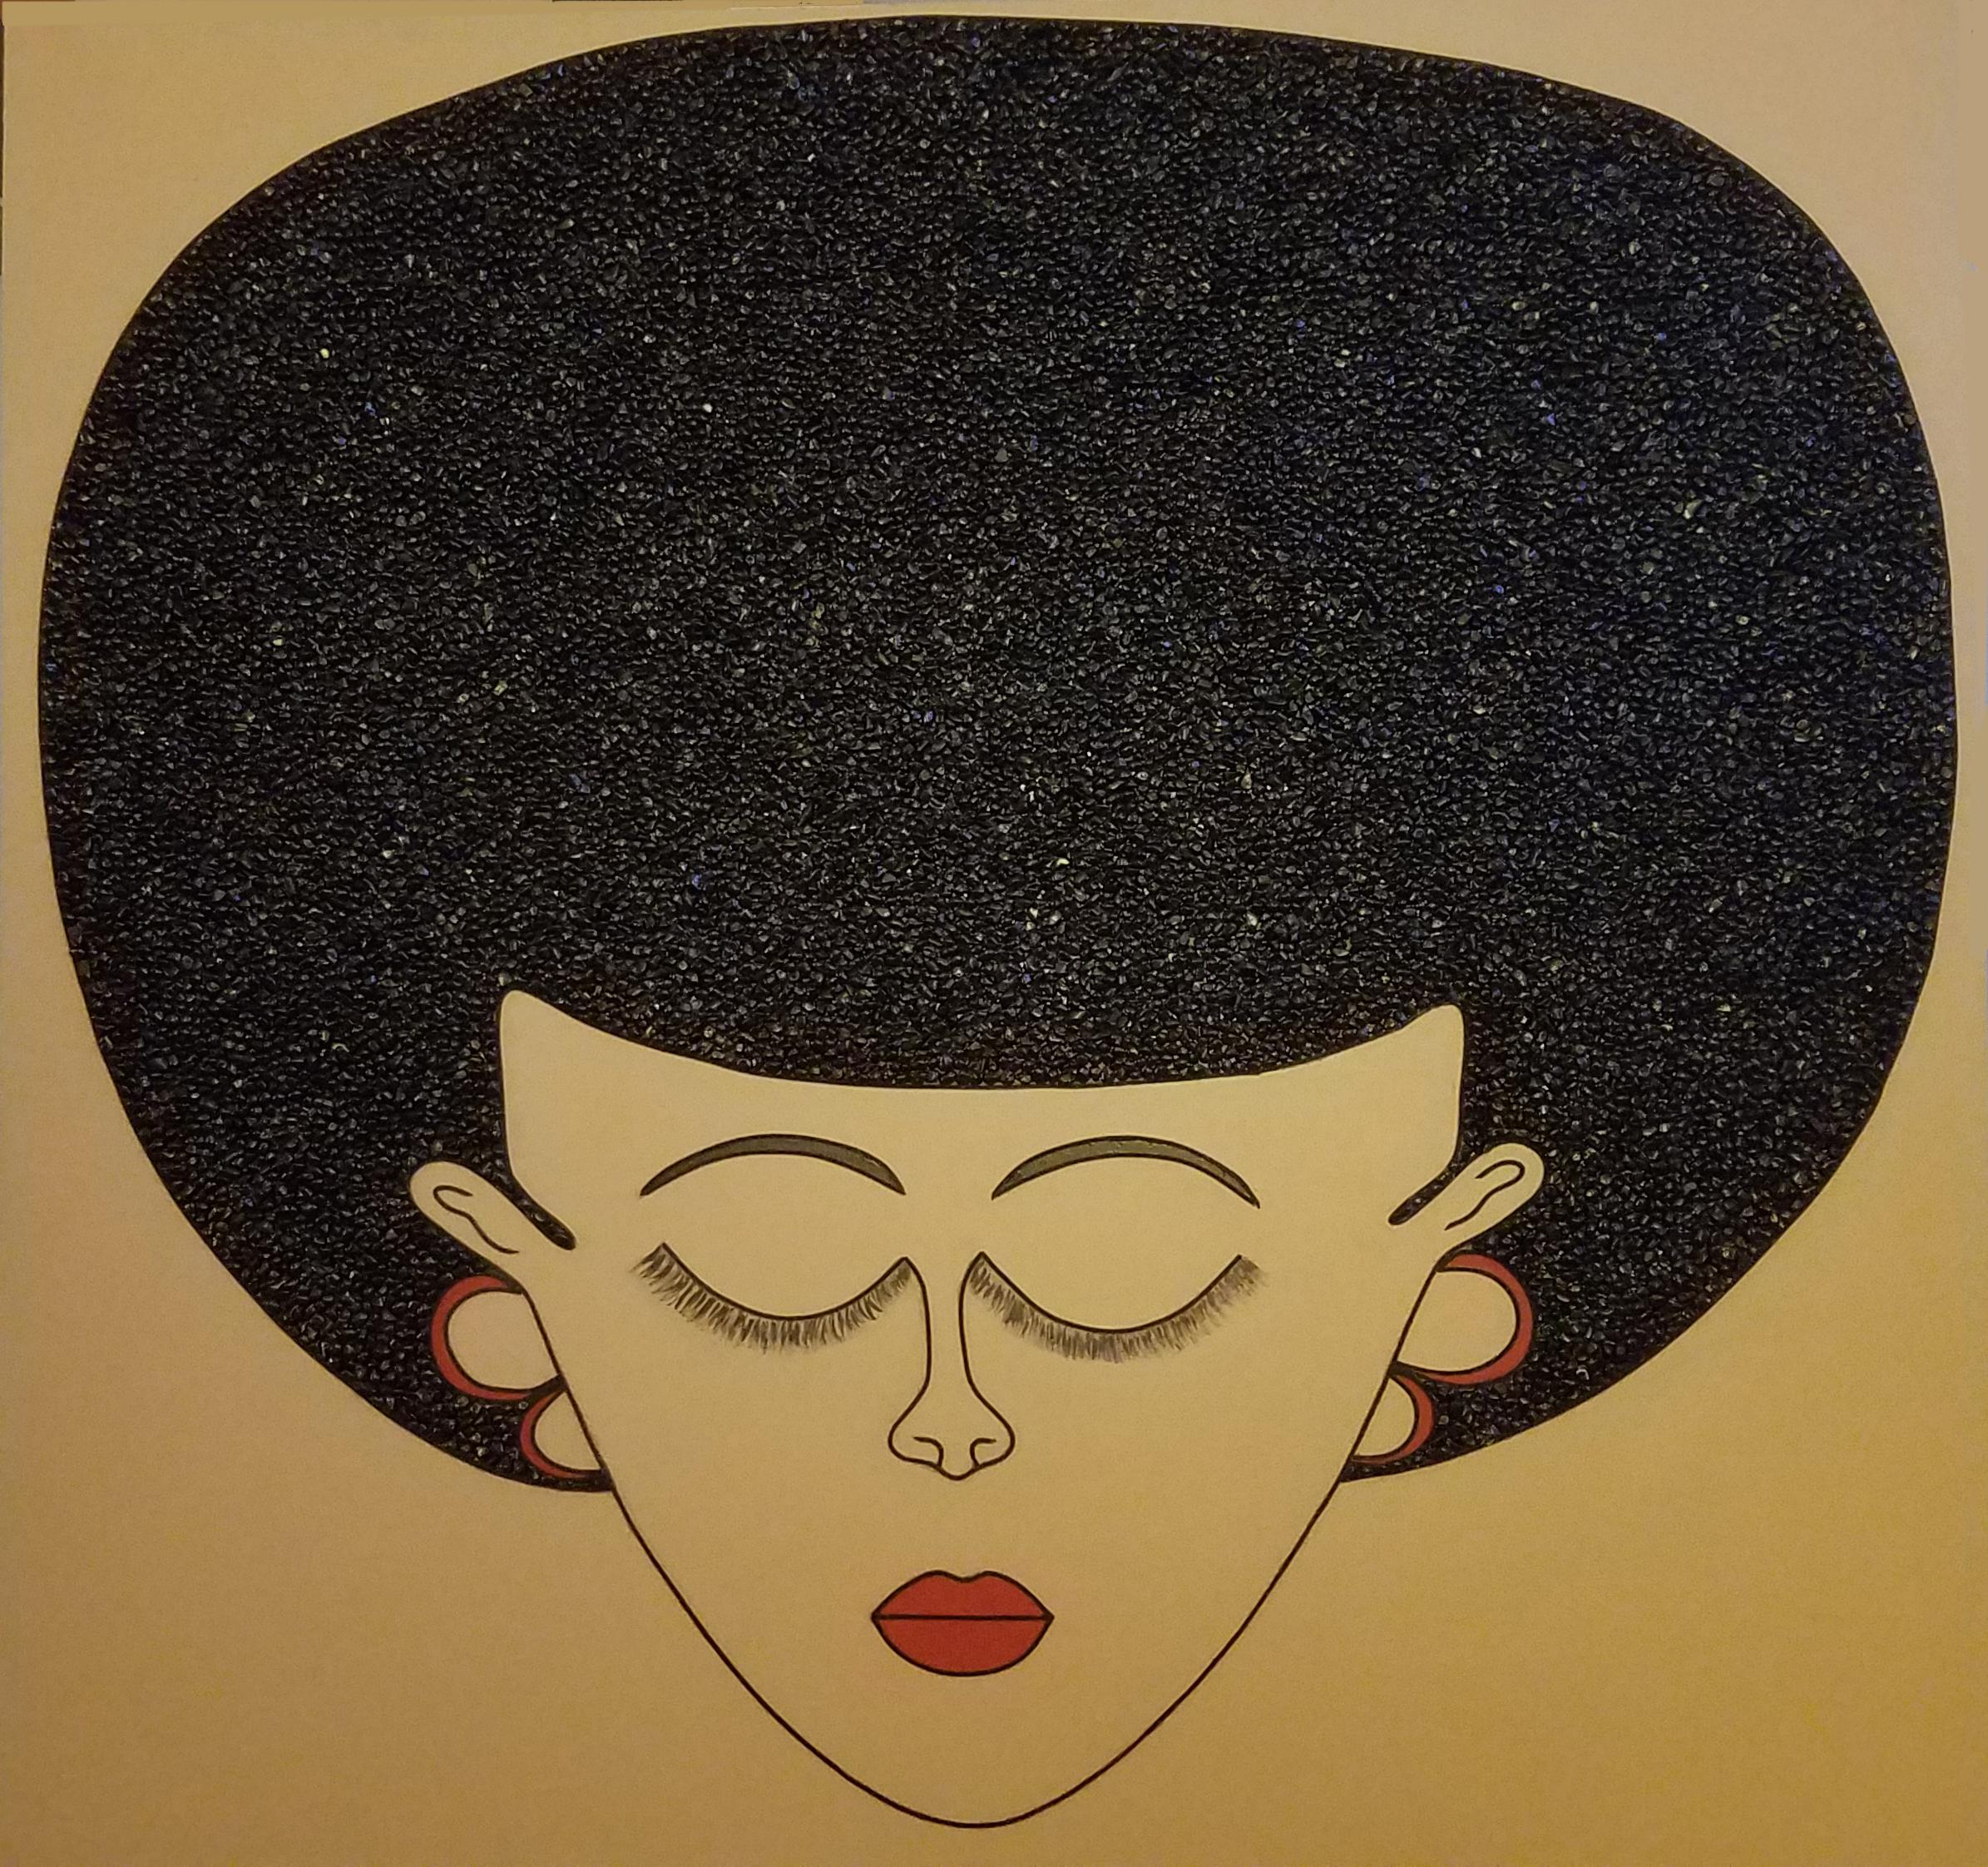 EBONEE artwork by JANICE - art listed for sale on Artplode